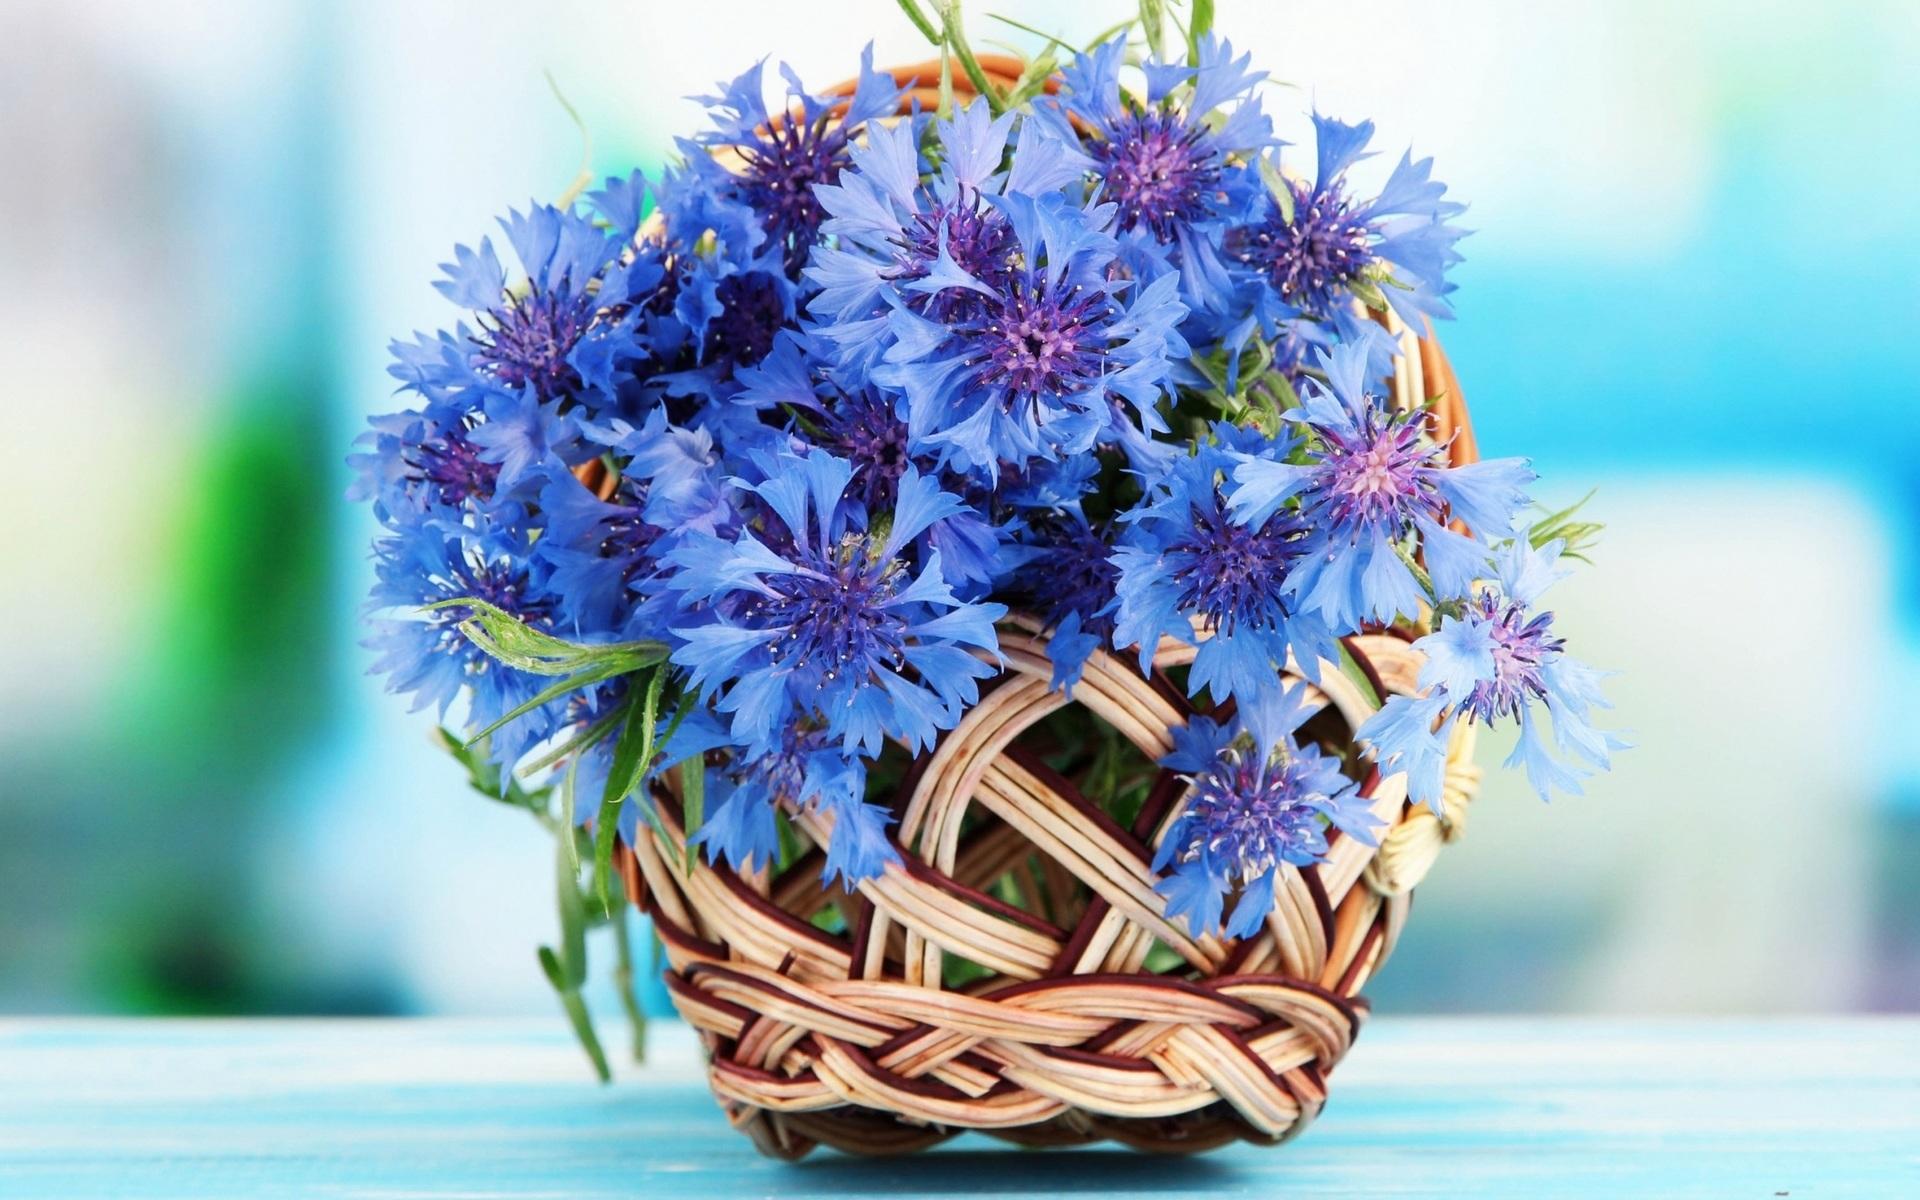 http://img.desktopwallpapers.ru/flowers/pics/wide/1920x1200/64277776c246c7e5f85596aa1ca9b940.jpg